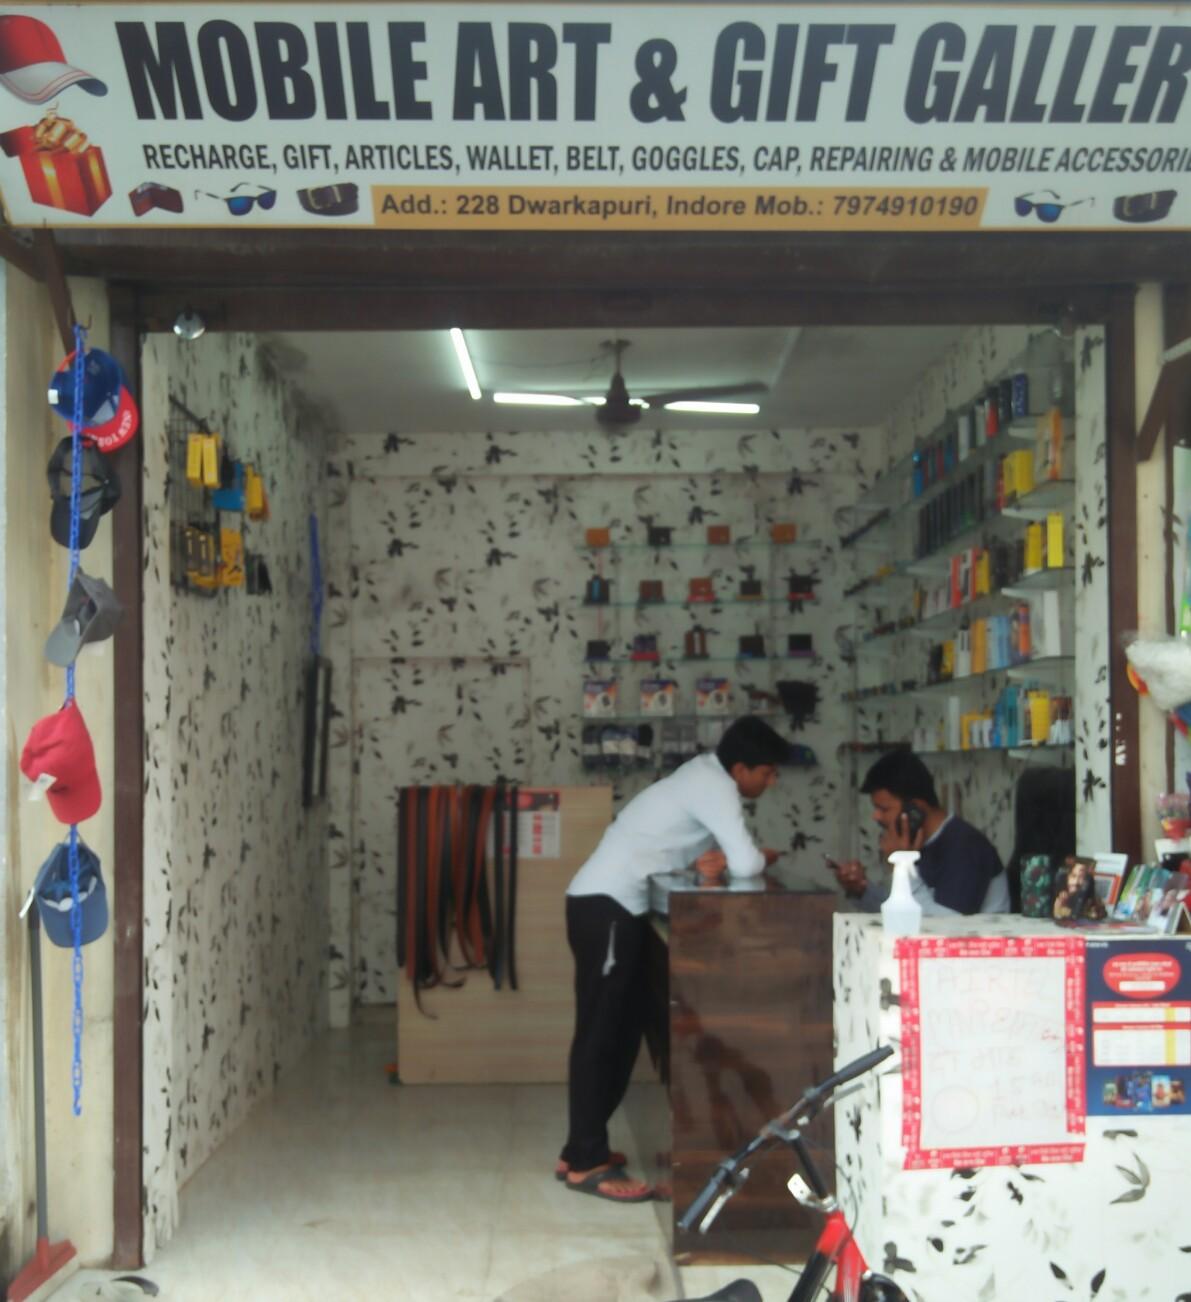 Mobile art & gift gallary